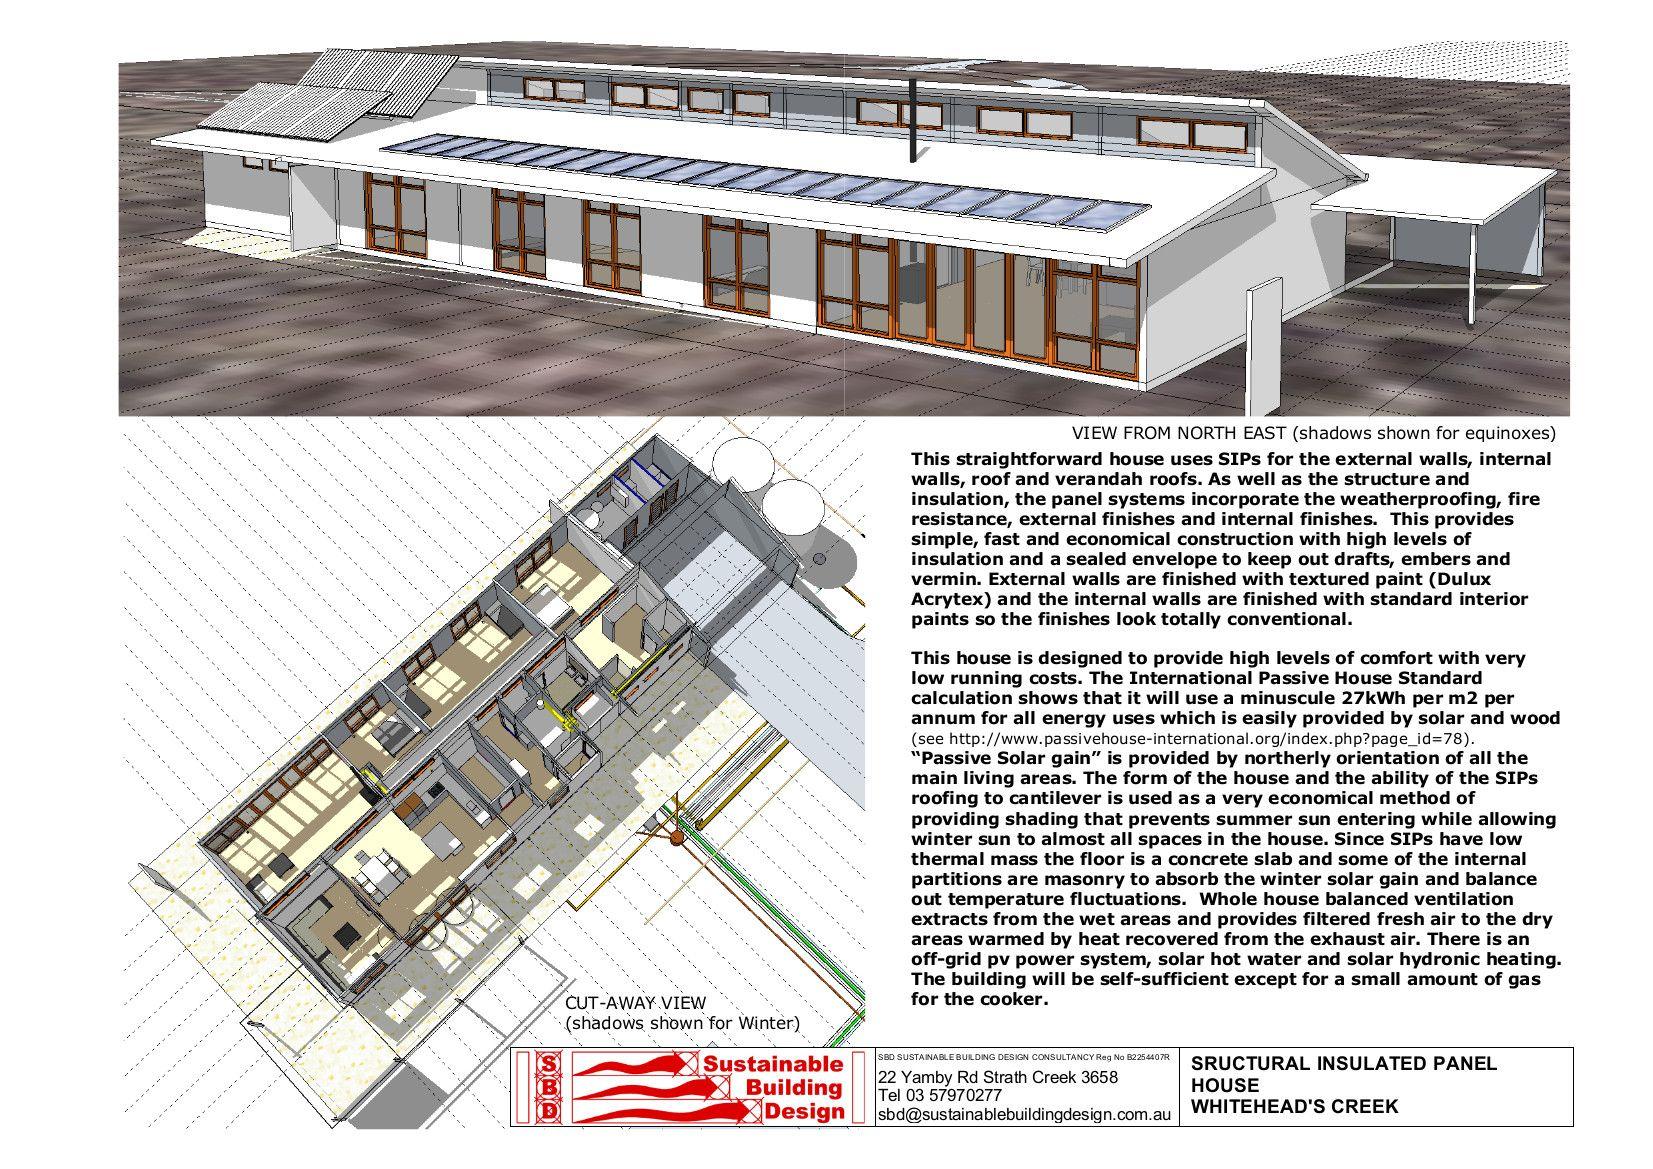 Http Www Sustainablebuildingdesign Com Au Sips 20house 20whiteheads 20ck2 Jpg Passive House Design House Plans Australia House Designs Ireland